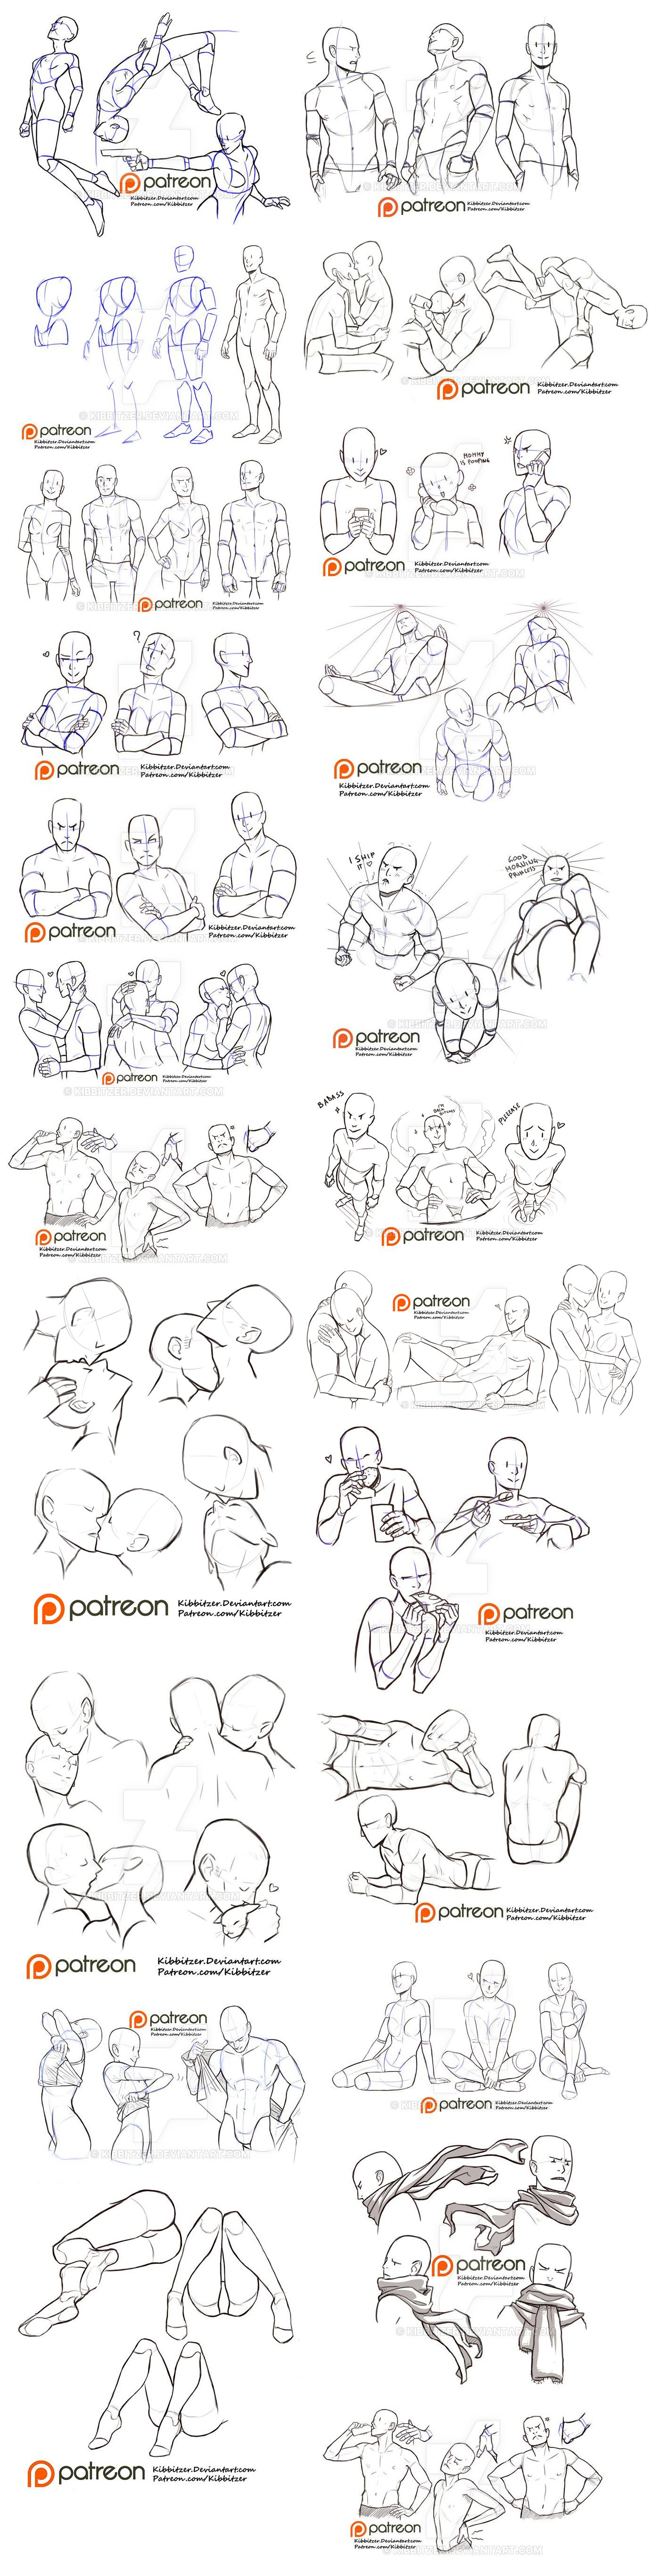 Pin von Jayson Patterson auf drawings / sketches | Pinterest ...